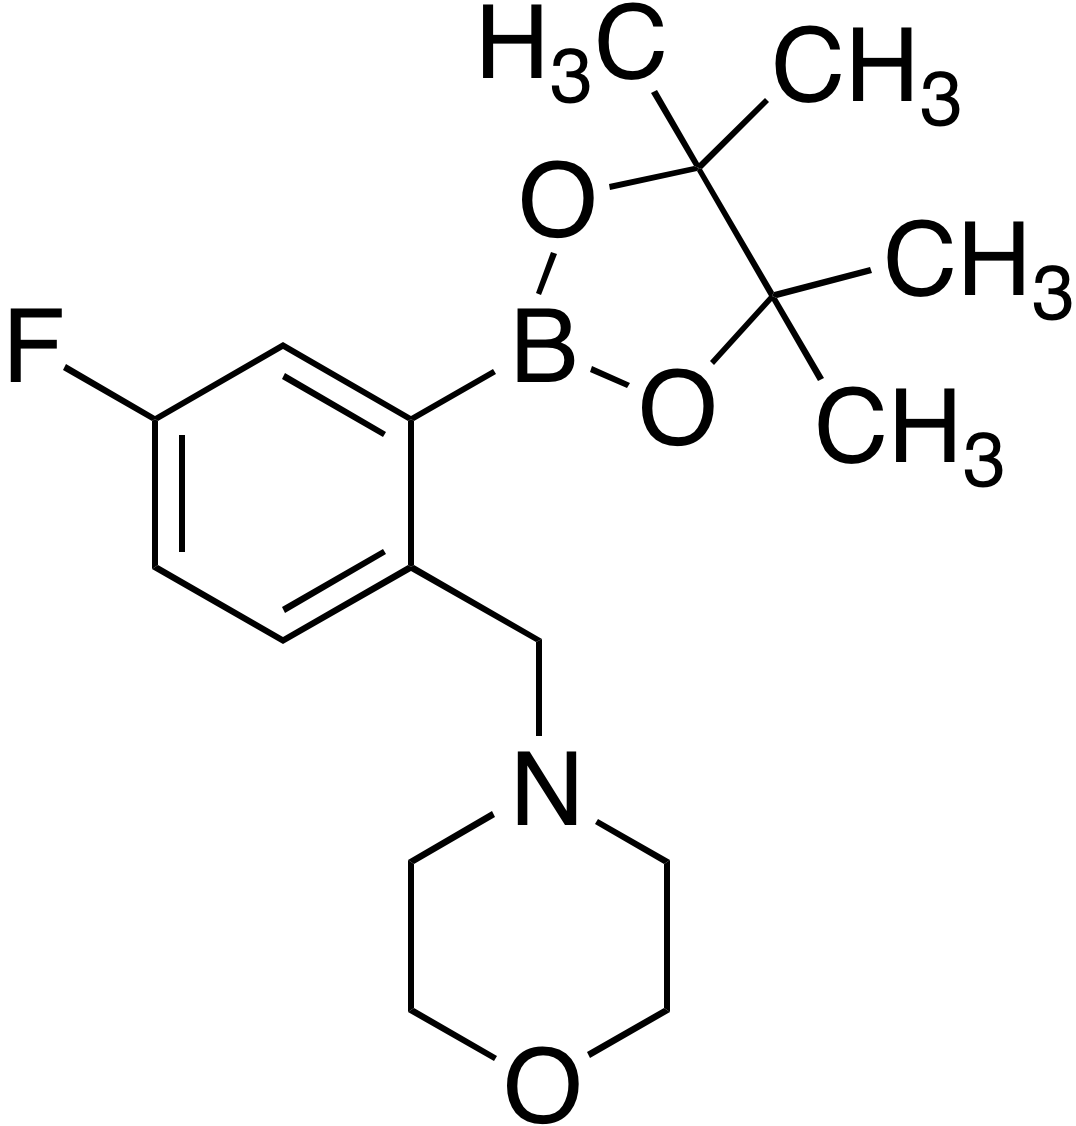 5-Fluoro-2-(4-morpholinylmethyl)benzeneboronic acid pinacol ester